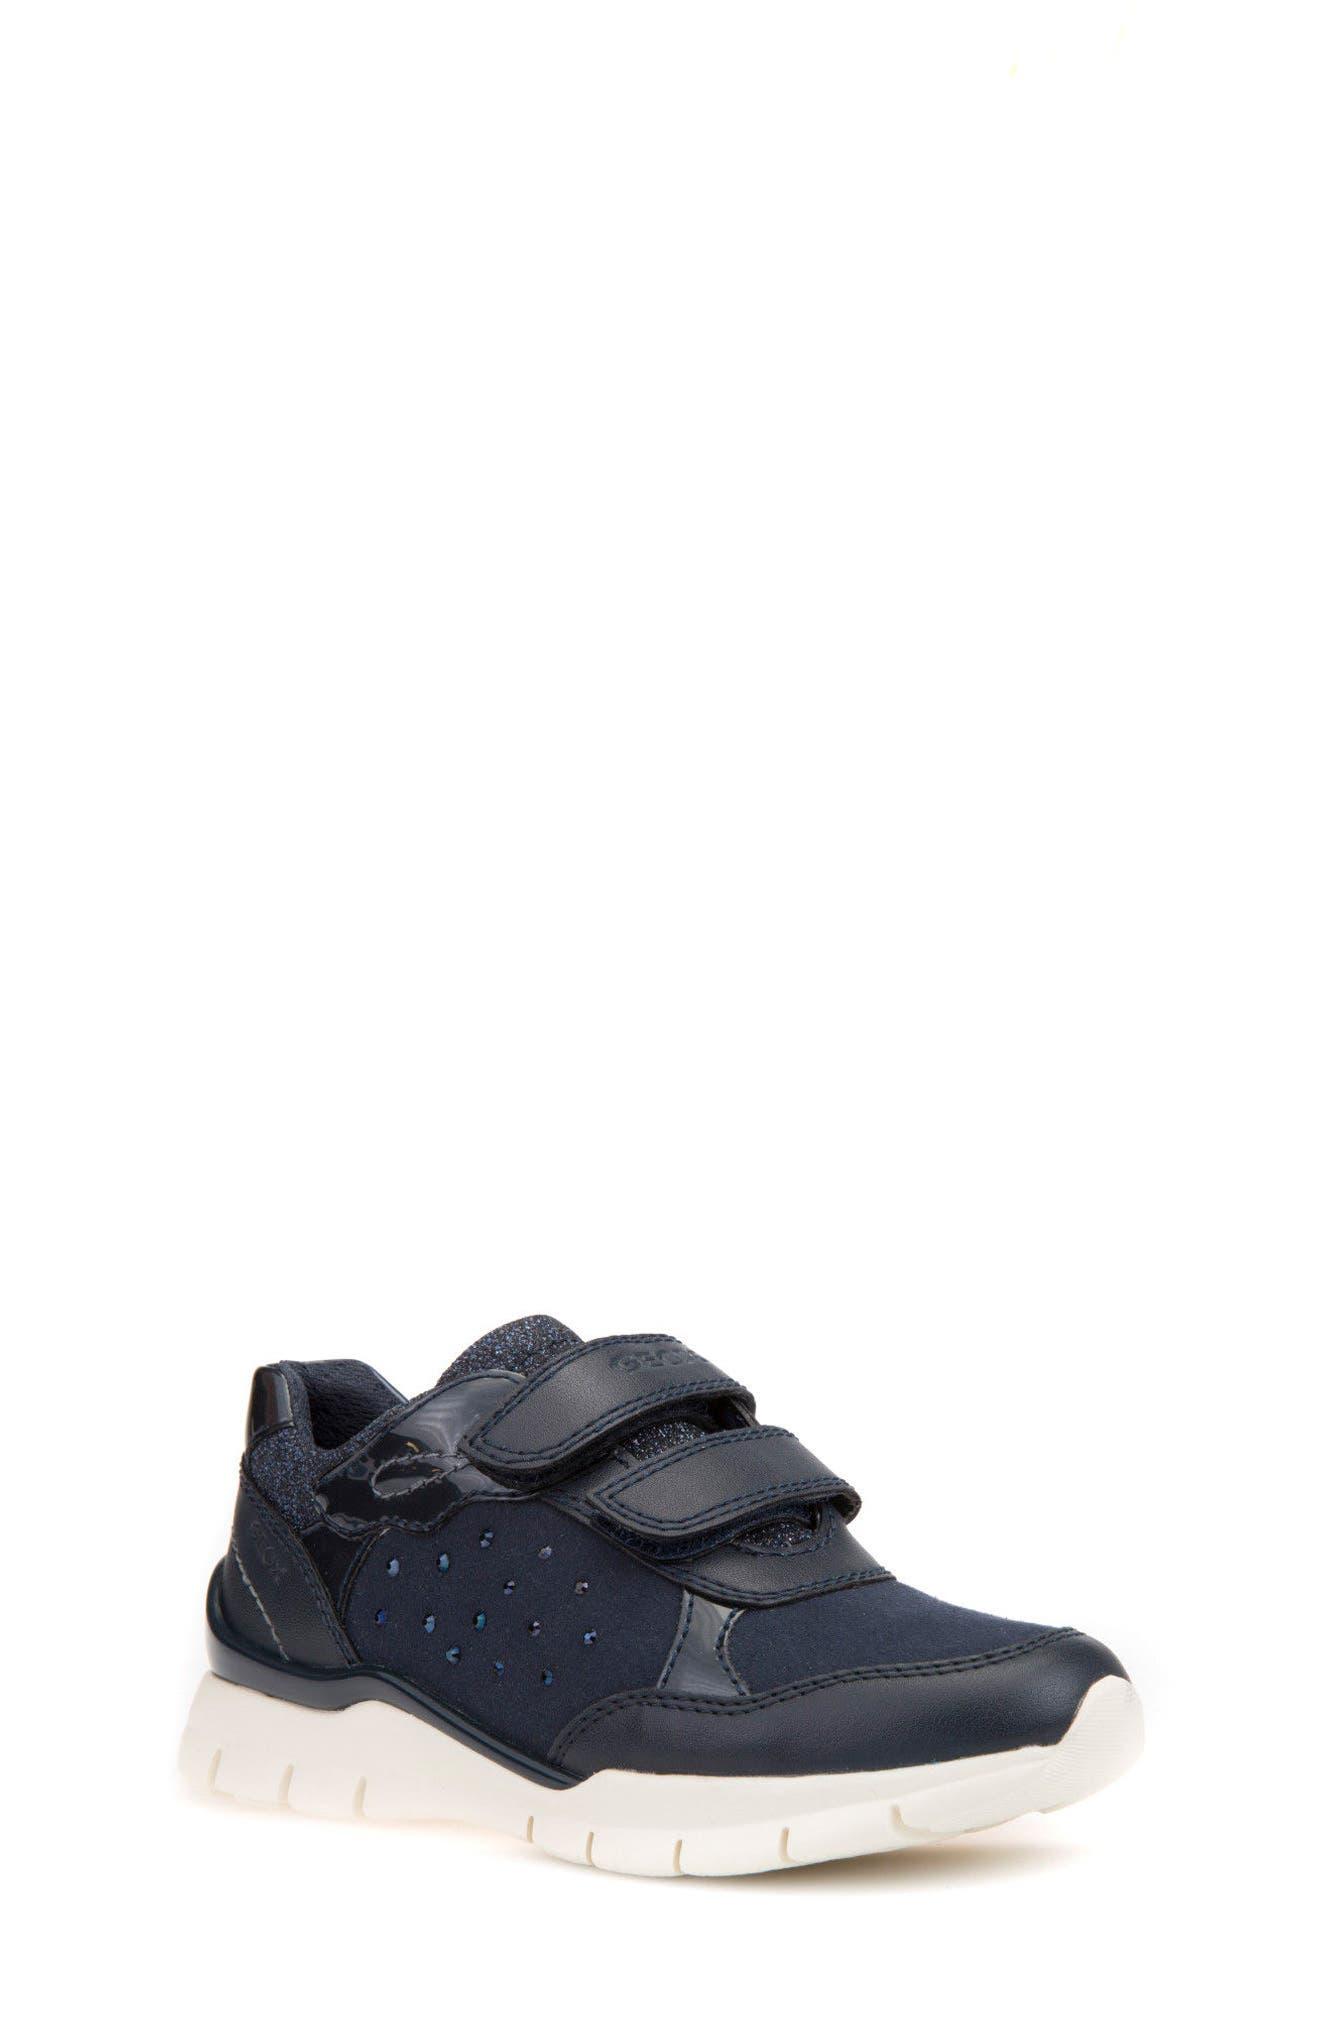 Geox Sukie Sneaker (Toddler, Little Kid & Big Kid)